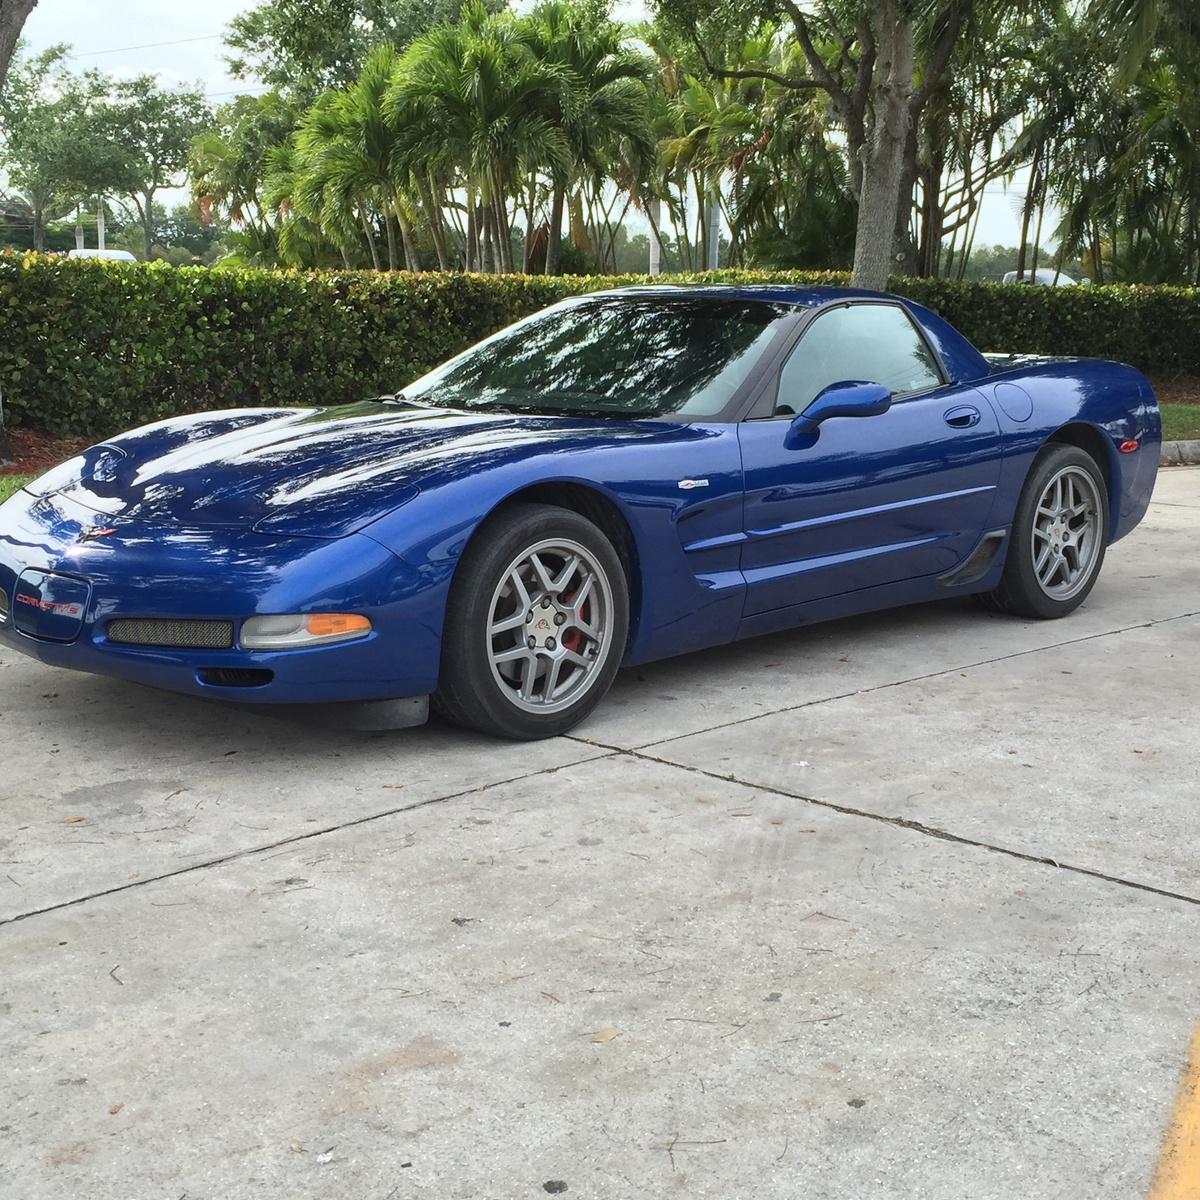 Chevrolet Dealer West Palm Beach: Used Chevrolet Corvette For Sale Fort Lauderdale, FL